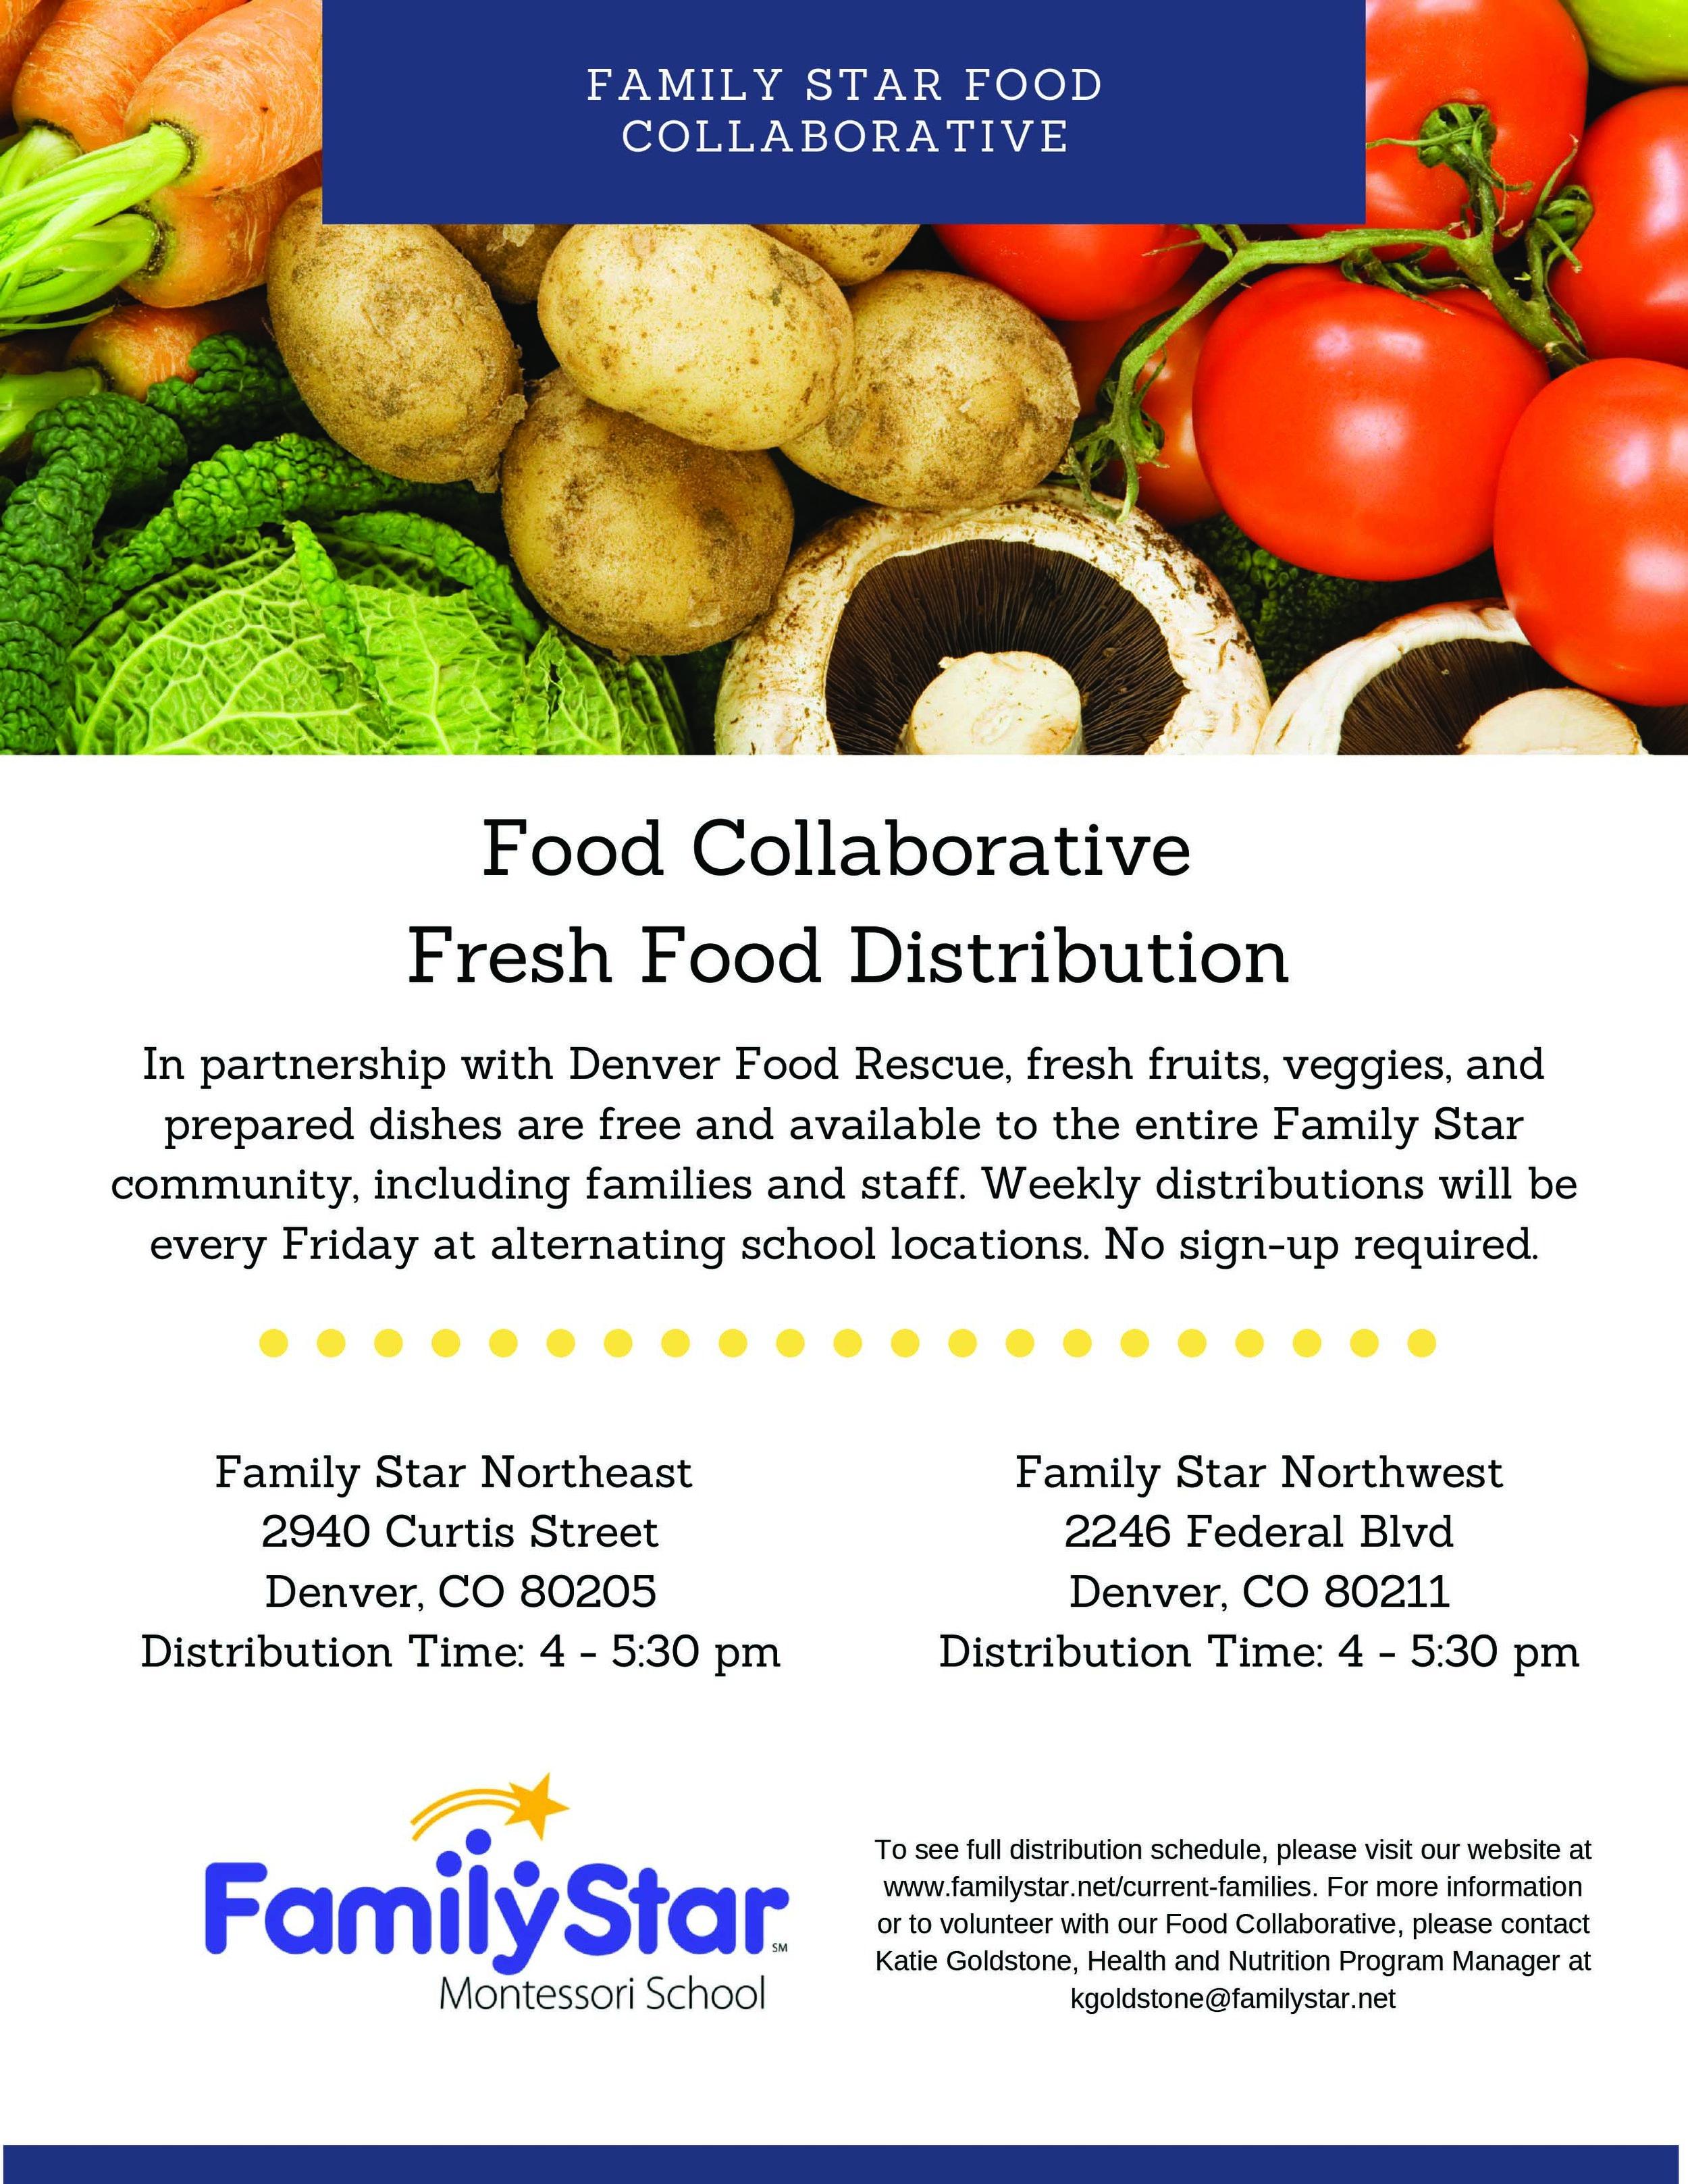 Food Collaborative General Flyer 2019.jpg